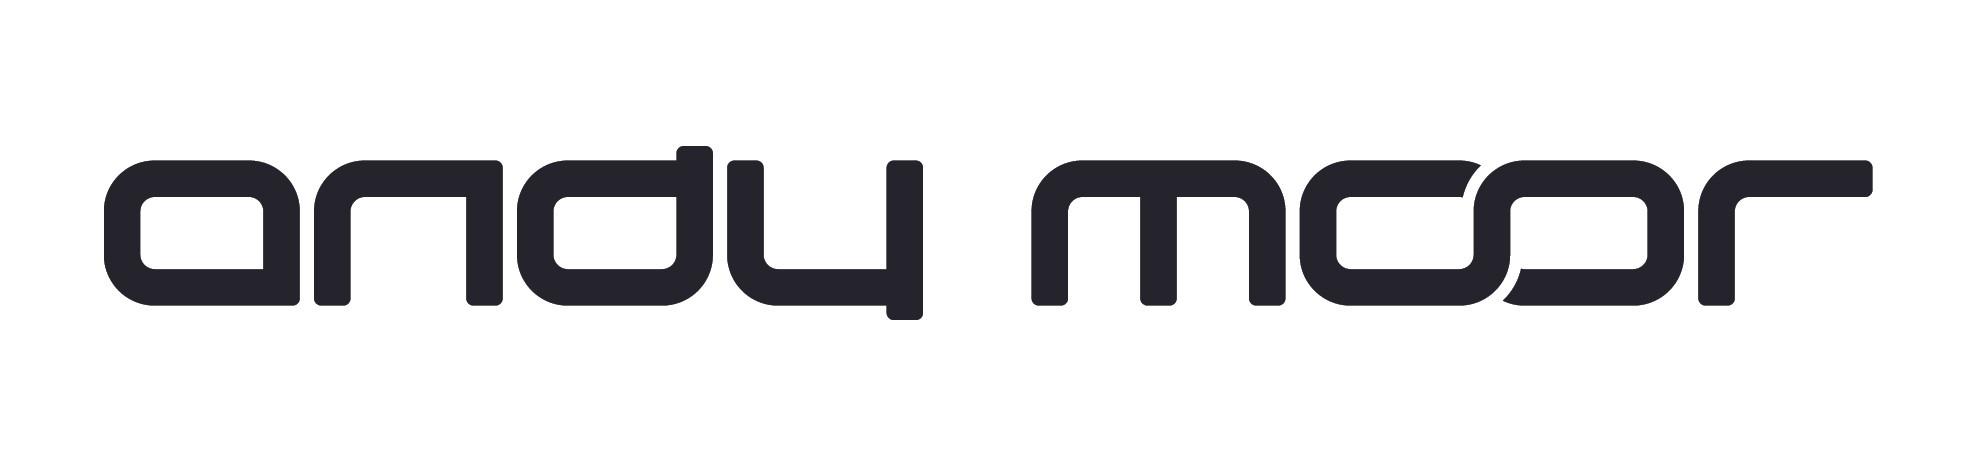 Andy_Moor_logo.jpg